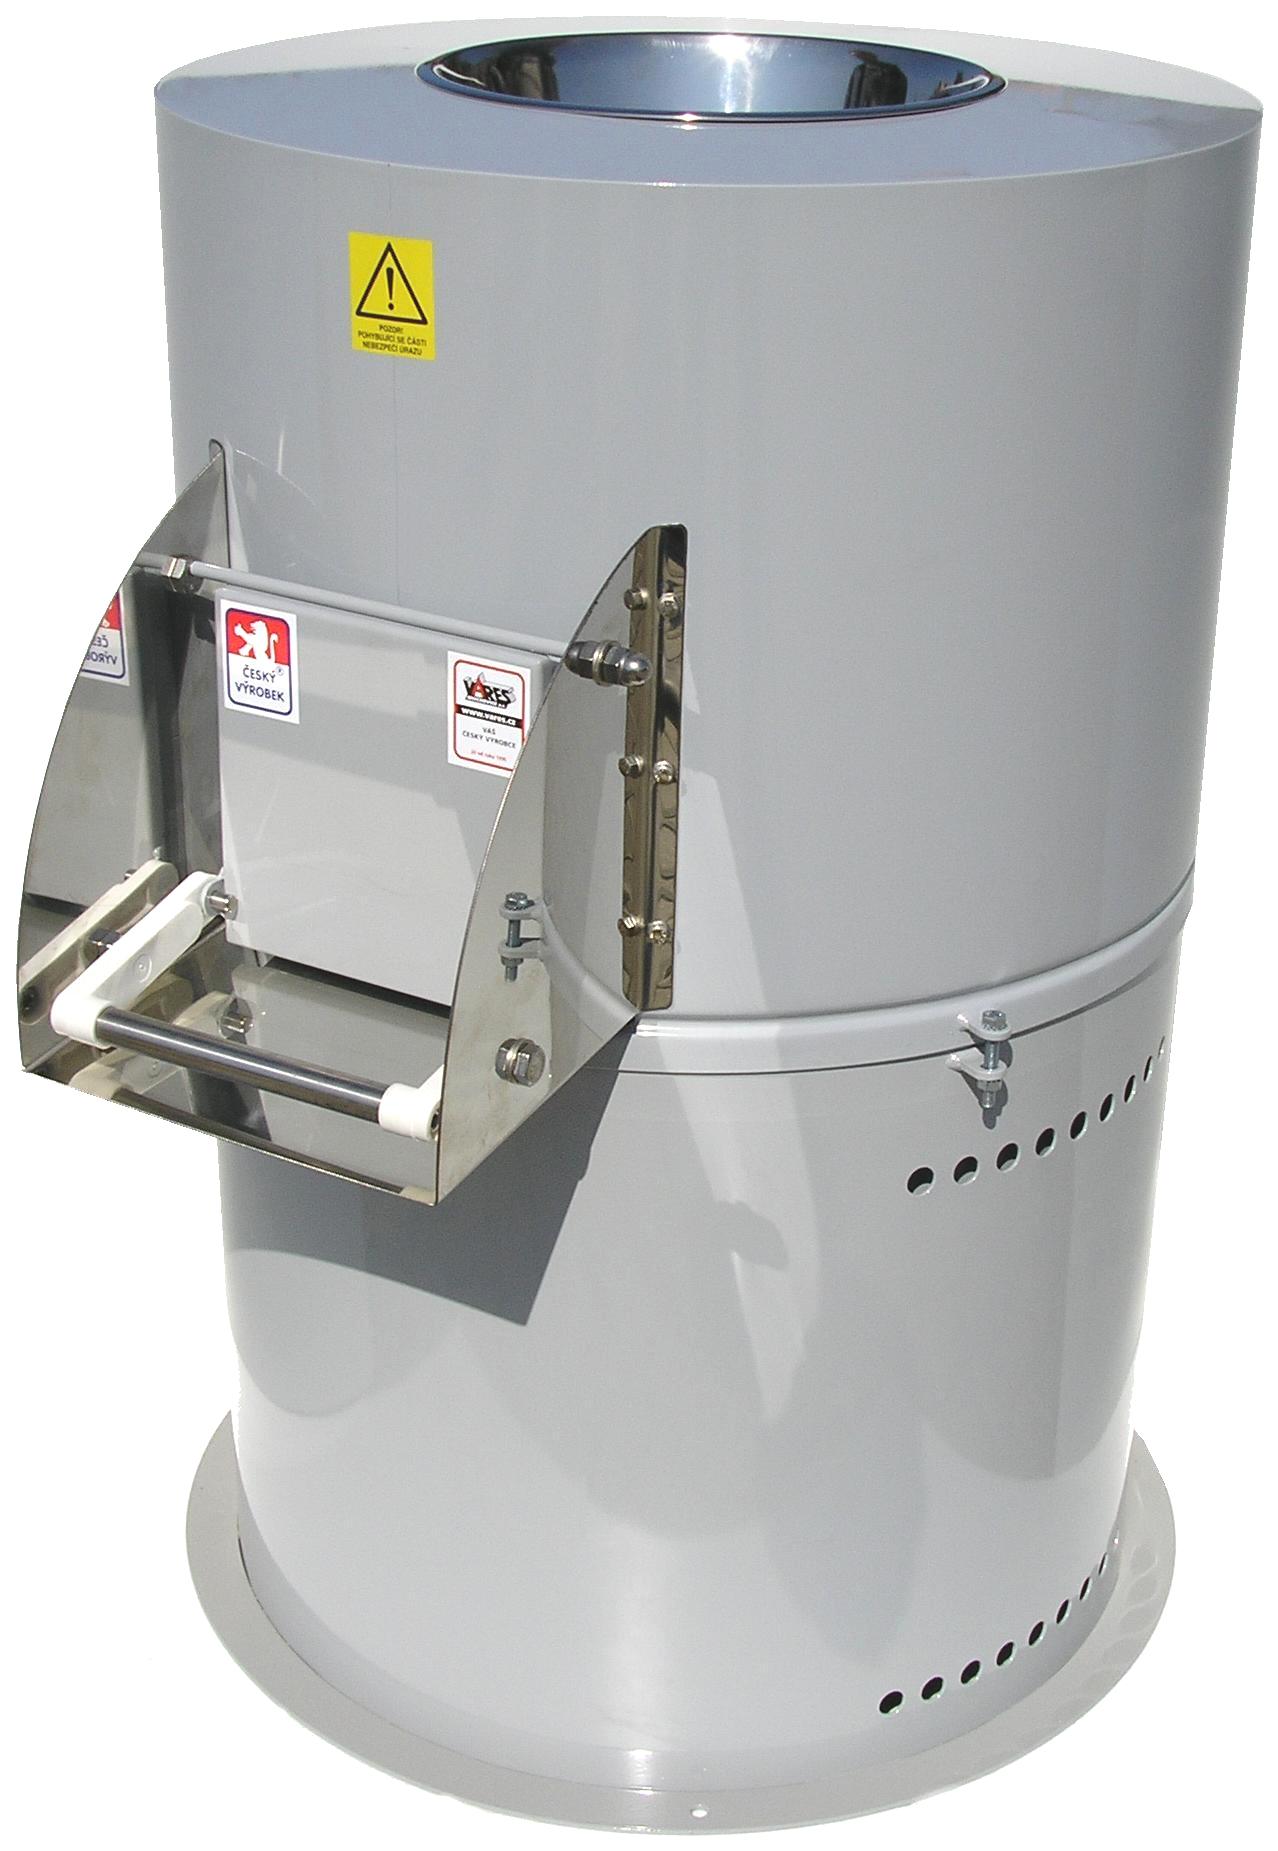 ŠKBZ 40L - Škrabka brambor LAK 40g/1 dávku